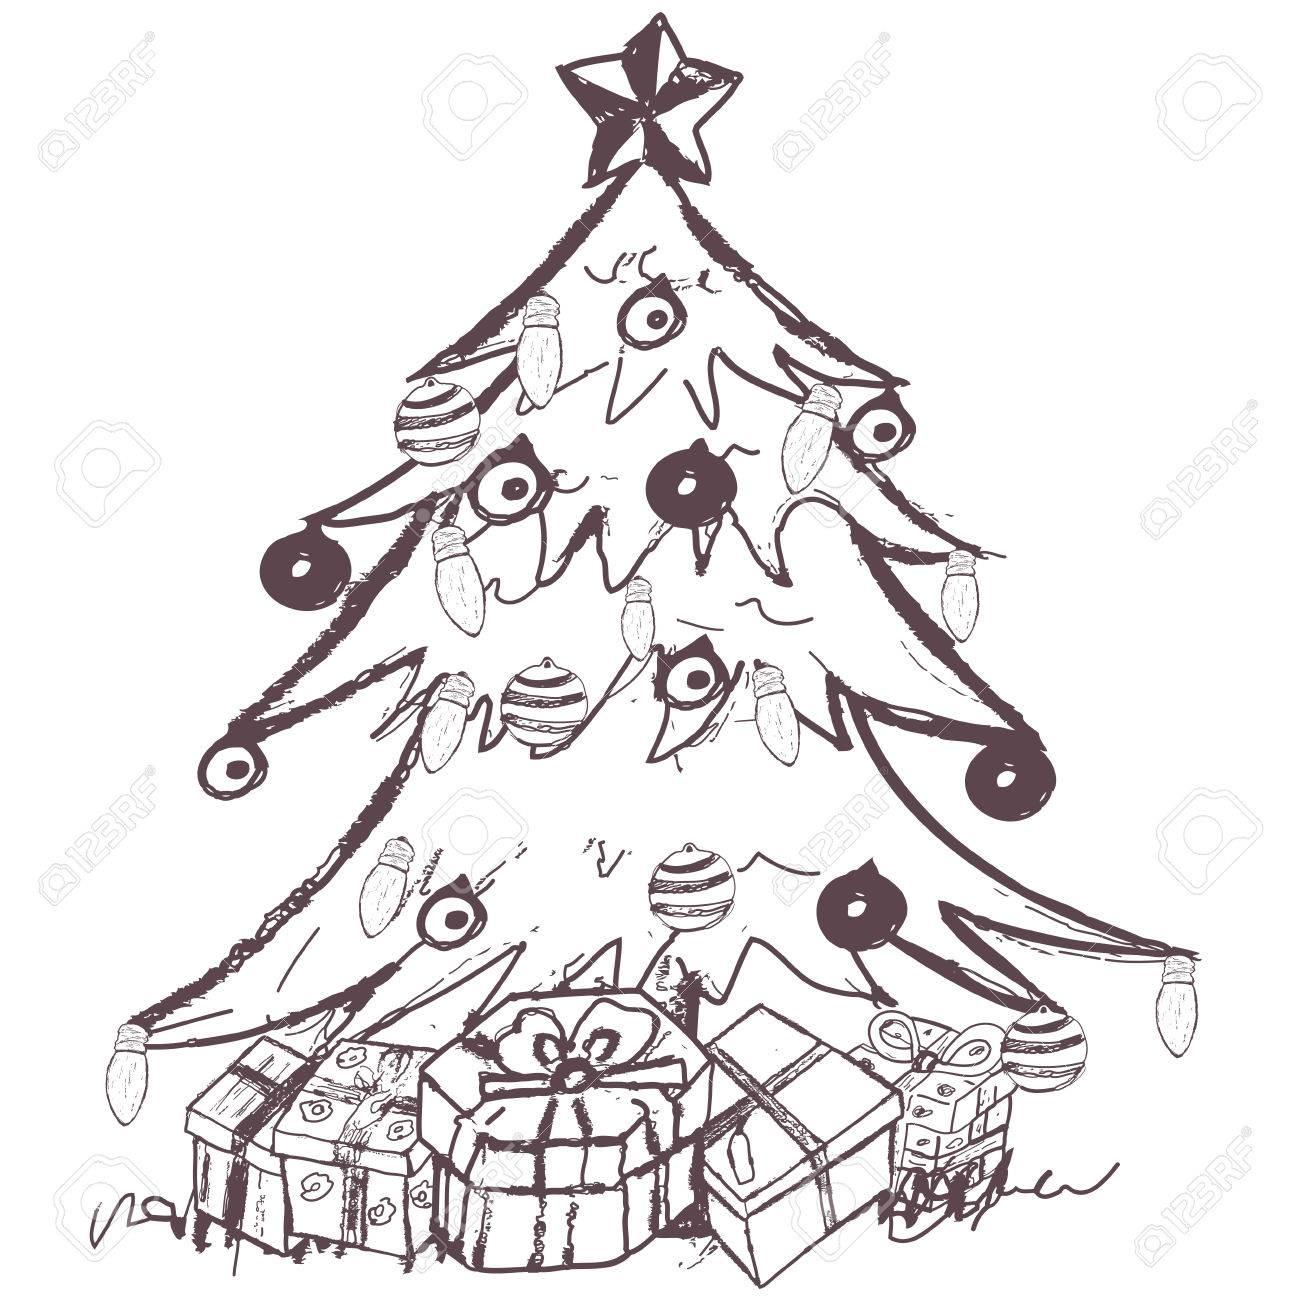 Drawing Christmas Tree Sketch.Hand Drawn Doodle Sketch Of A Christmas Tree With Presents